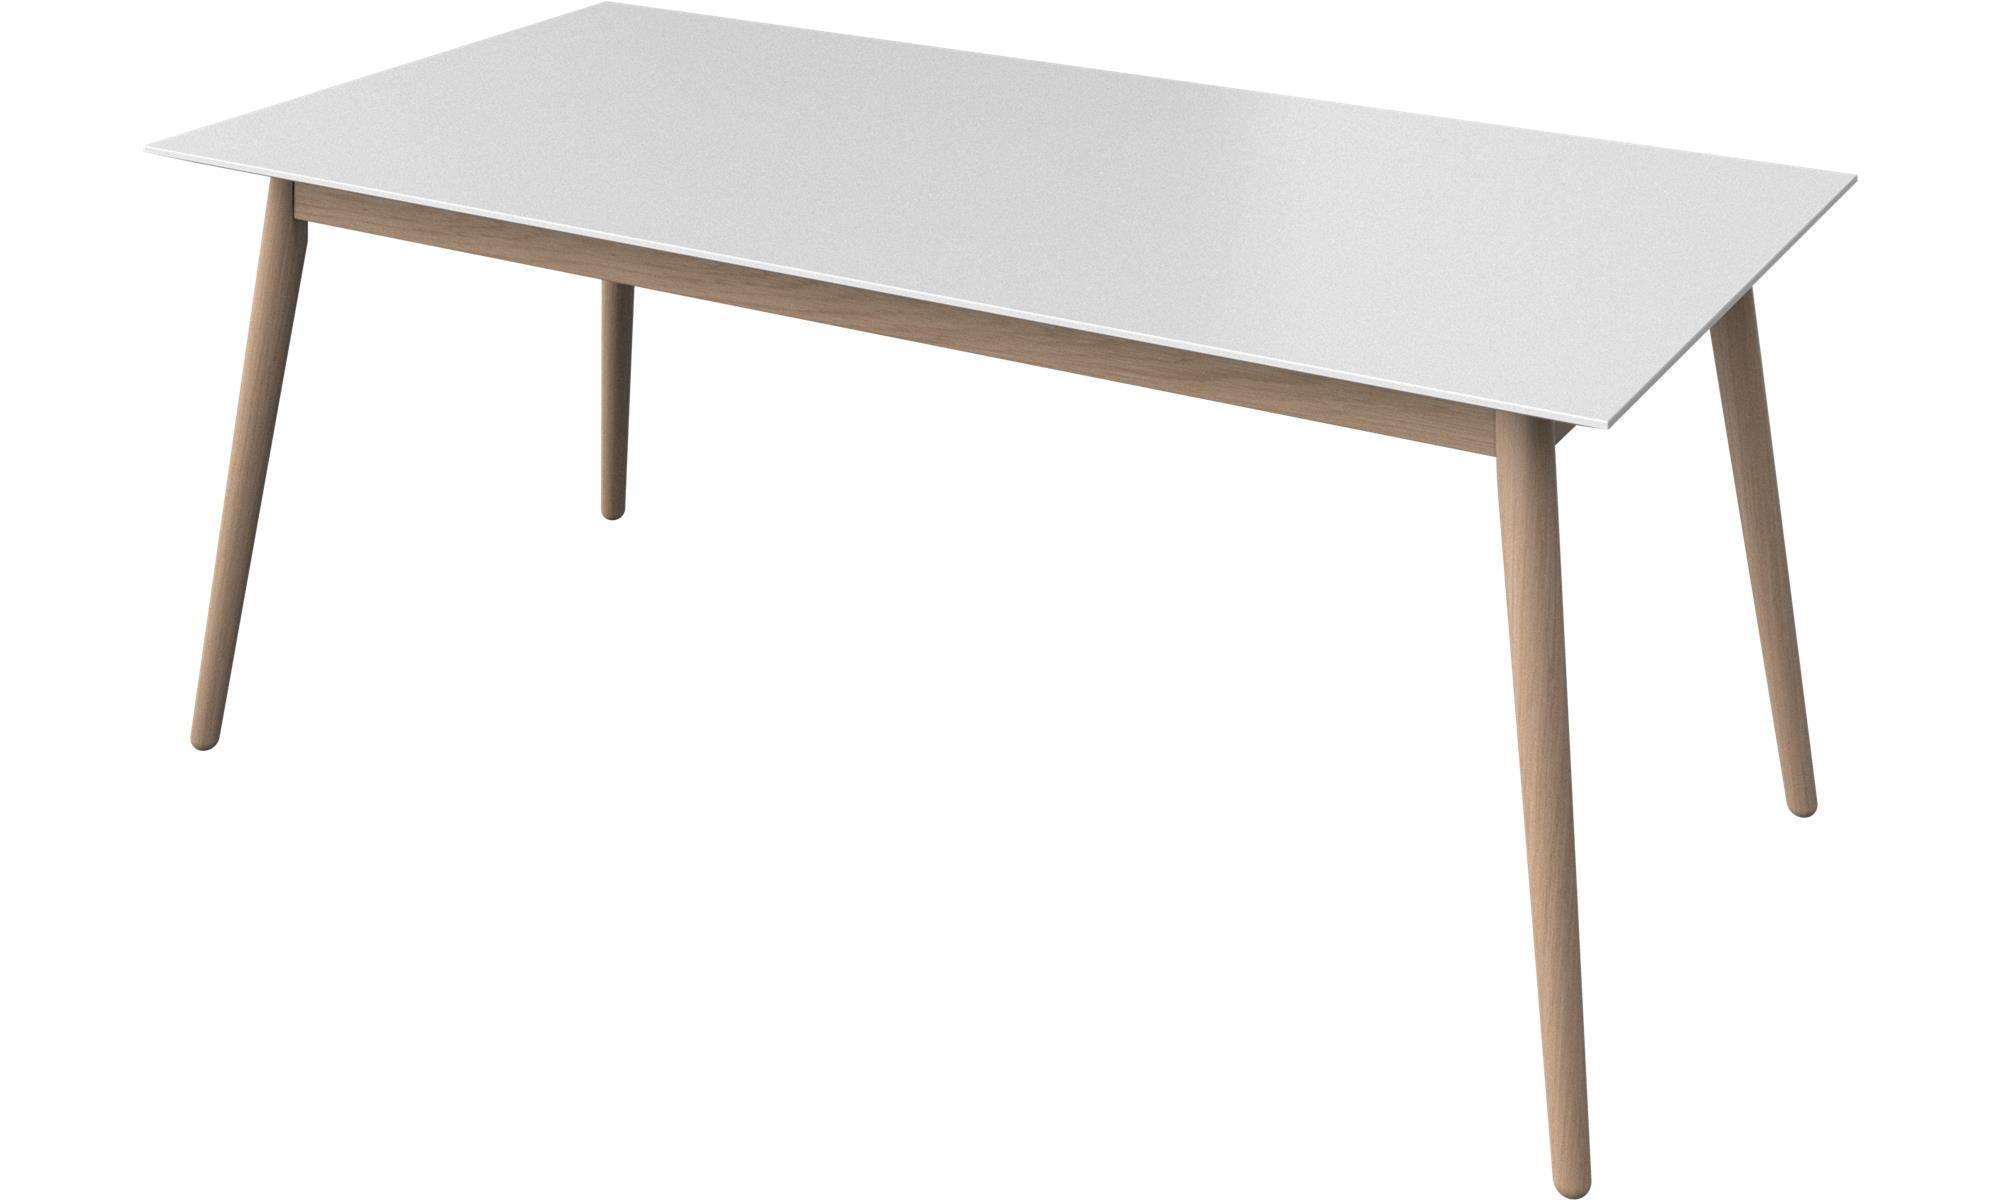 Tables De Salle A Manger Table Milano Carre Blanc Laque